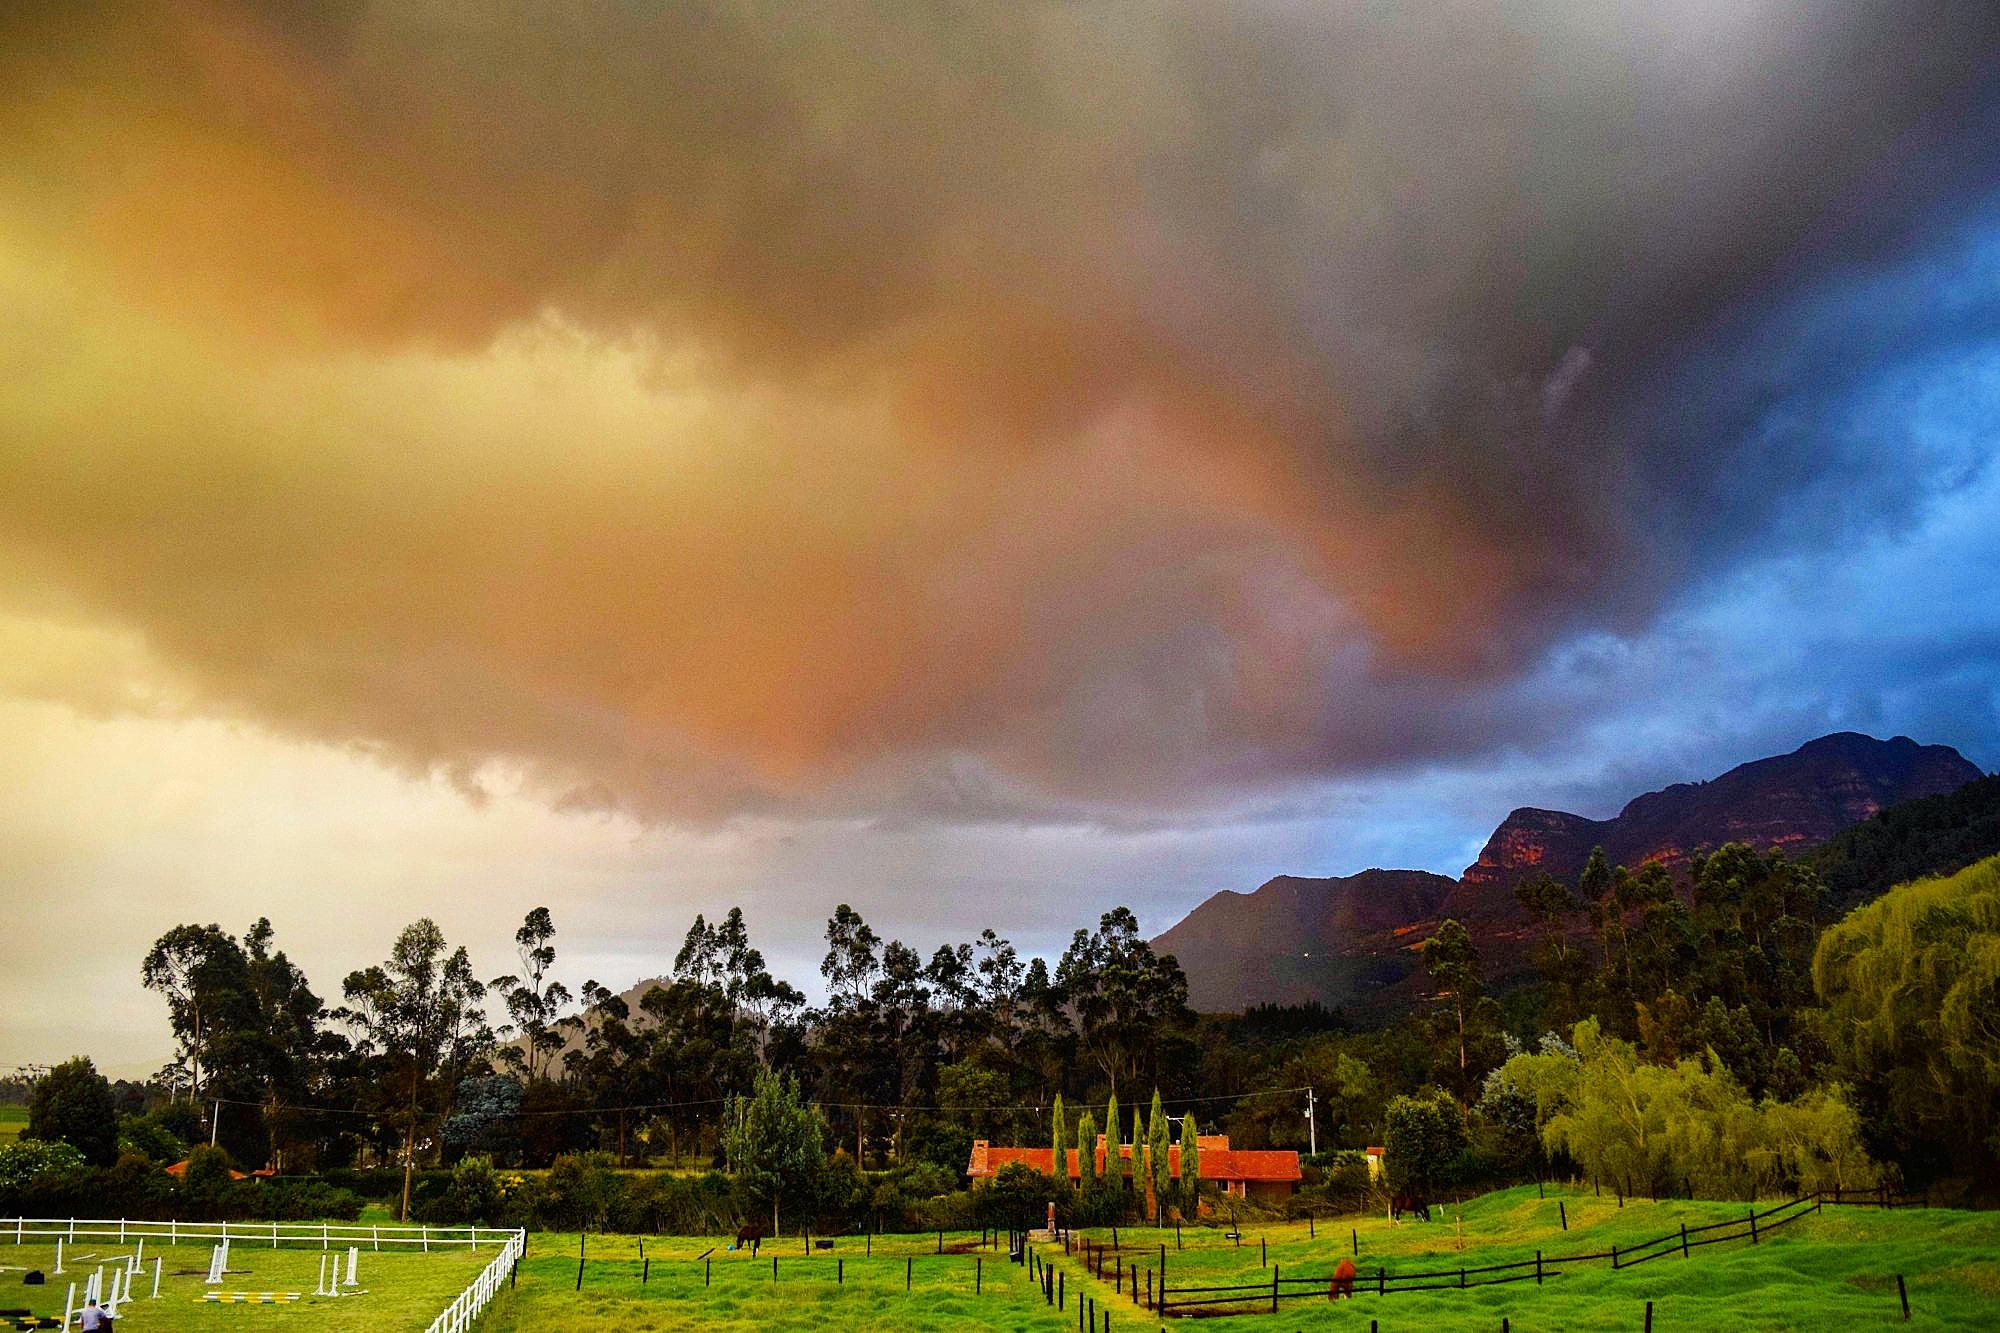 Regen en onweer in Colombia